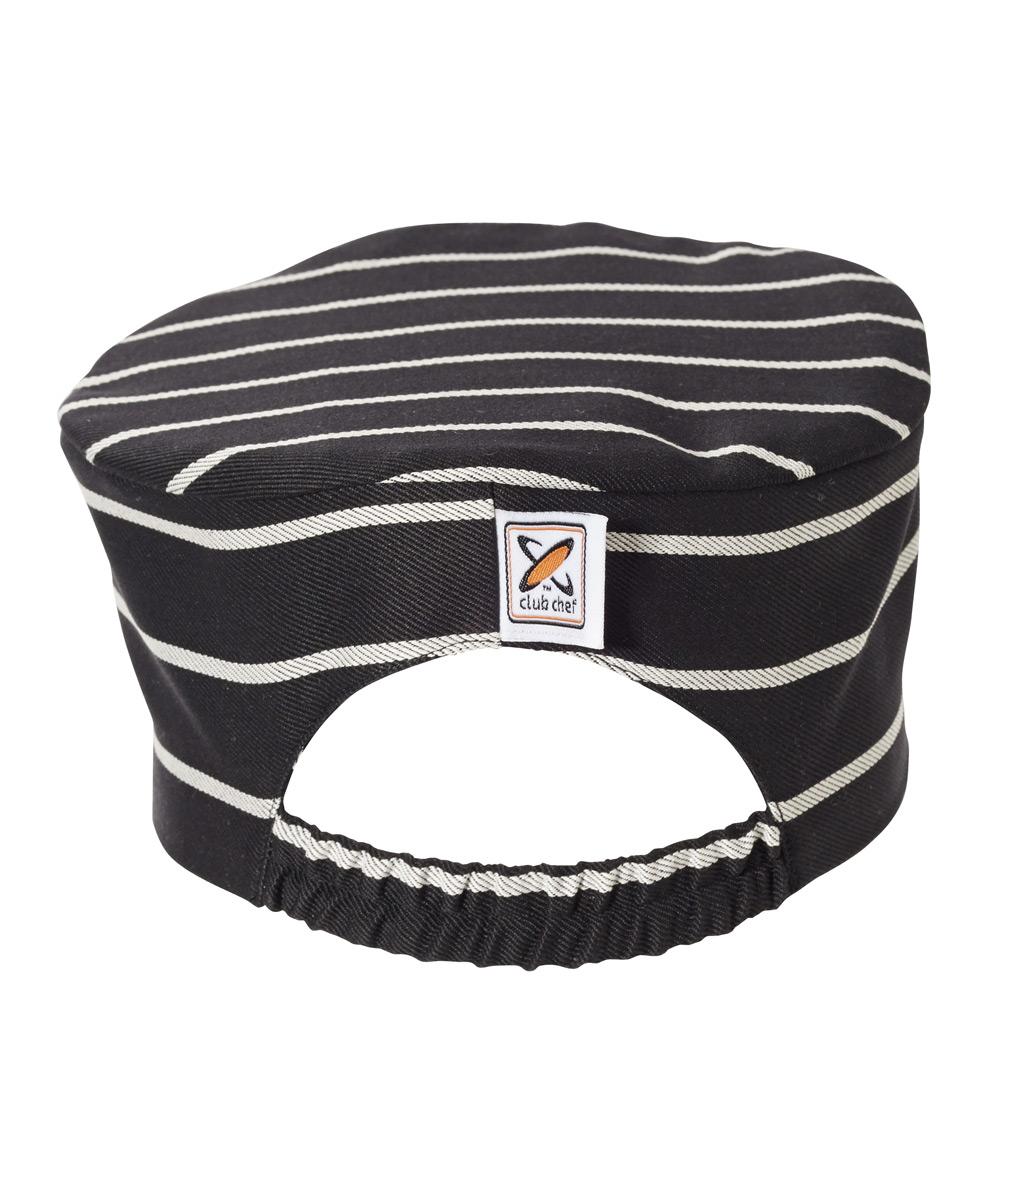 Flat Top Hat Pinstripe by Club Chef Chef Uniforms 2